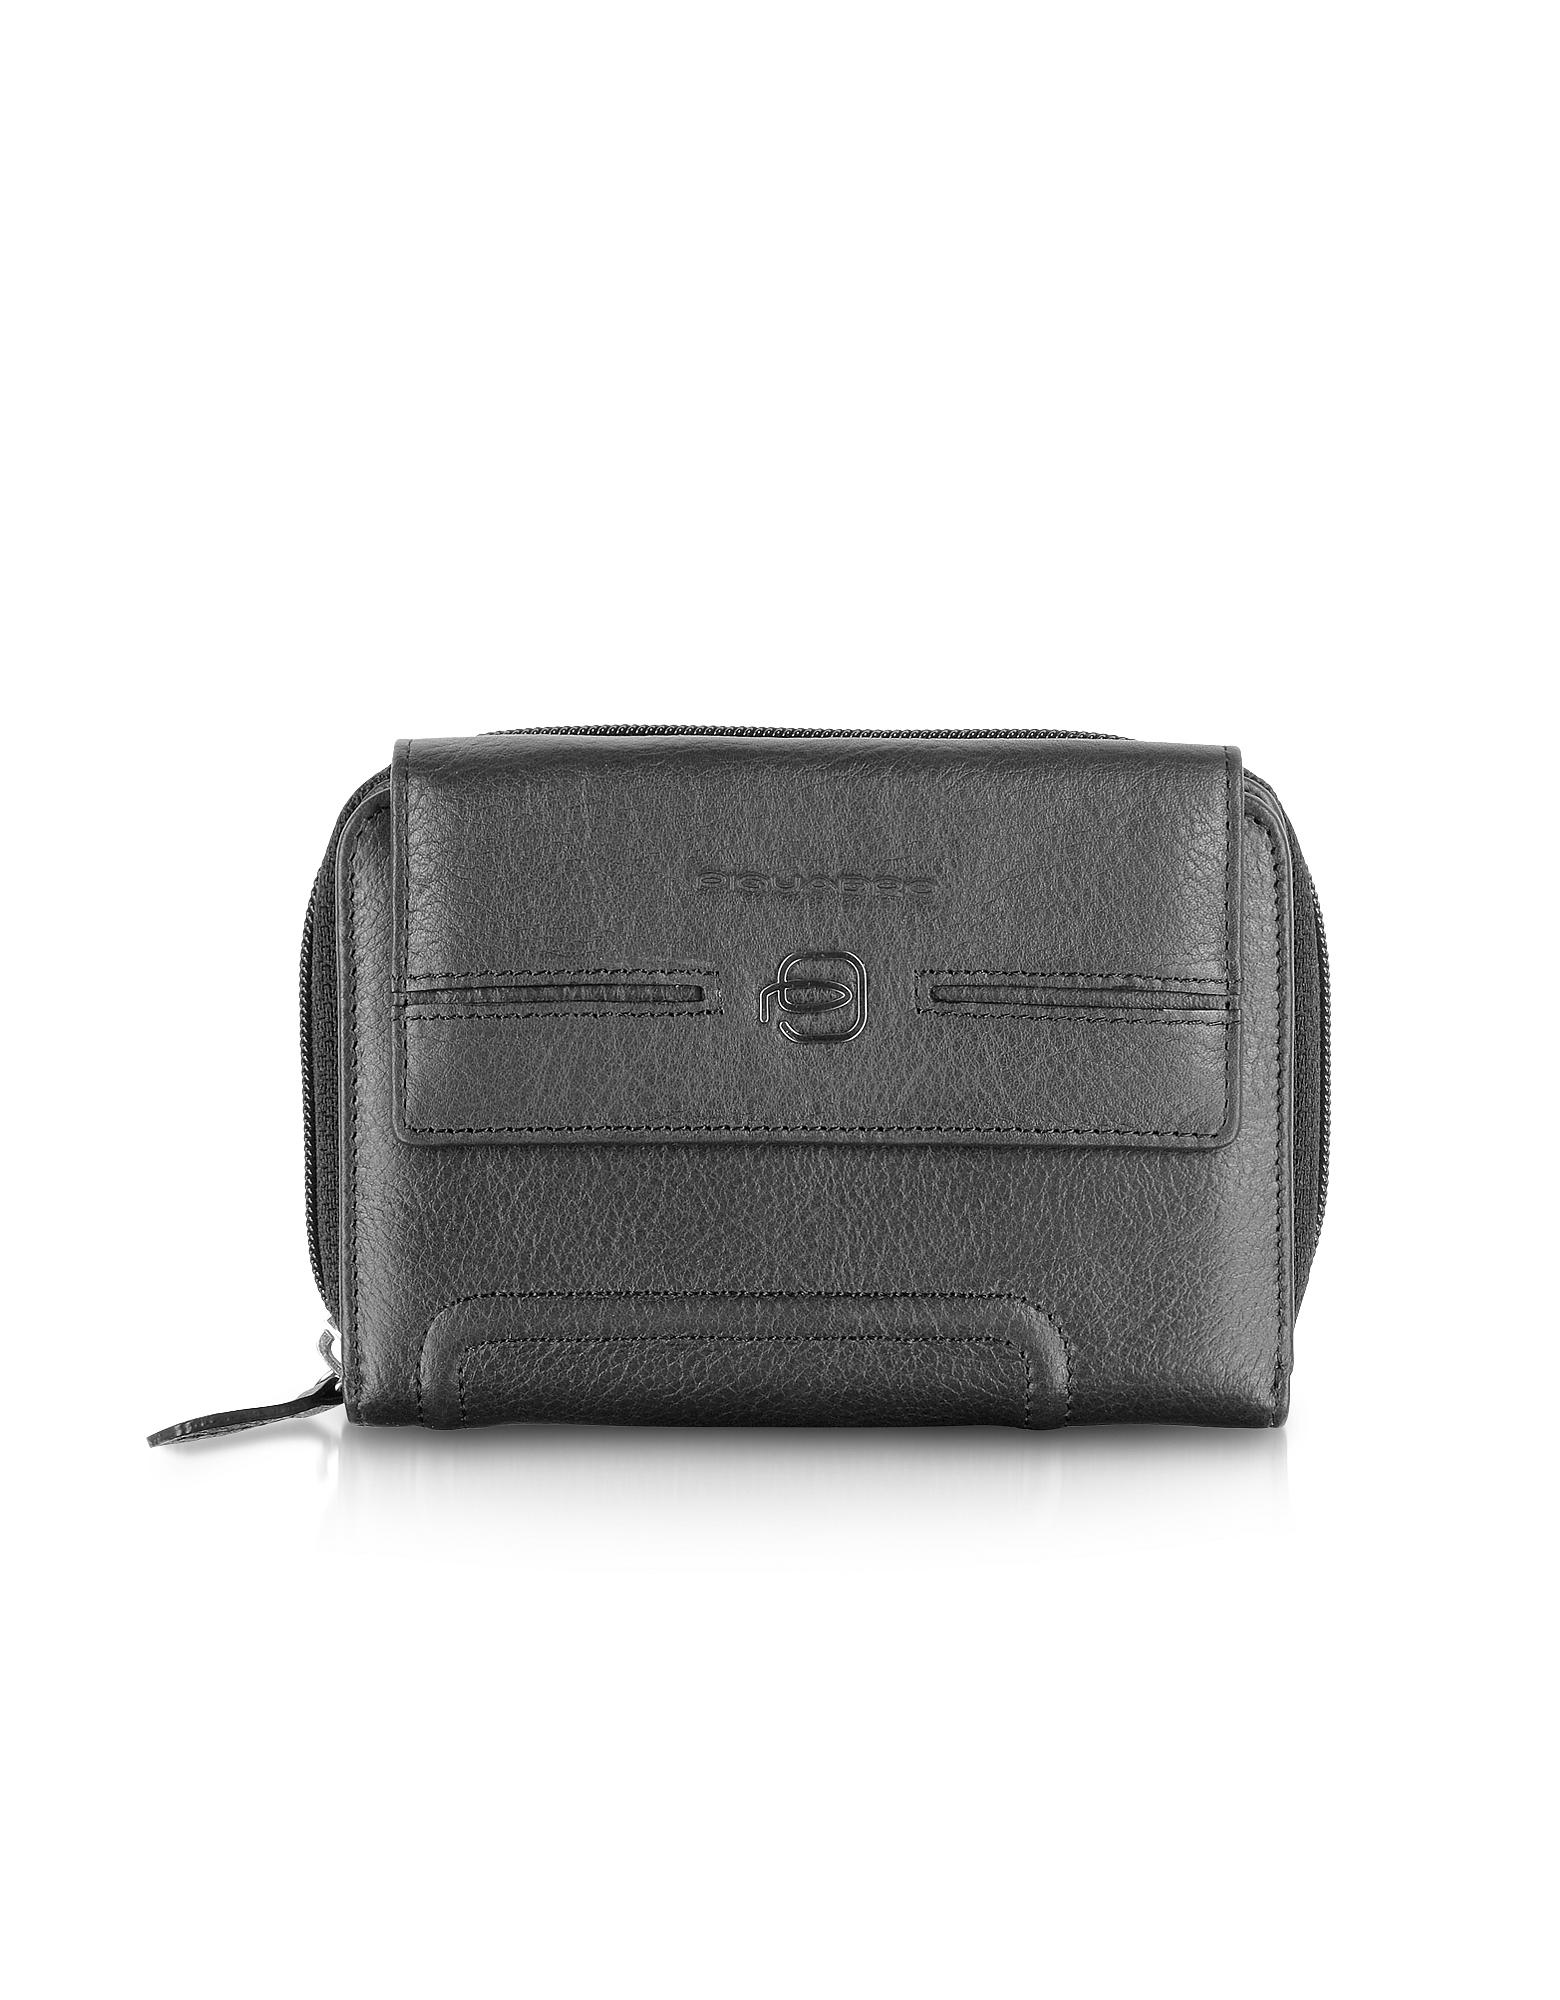 Vibe - Кожаный Бумажник с Клапаном